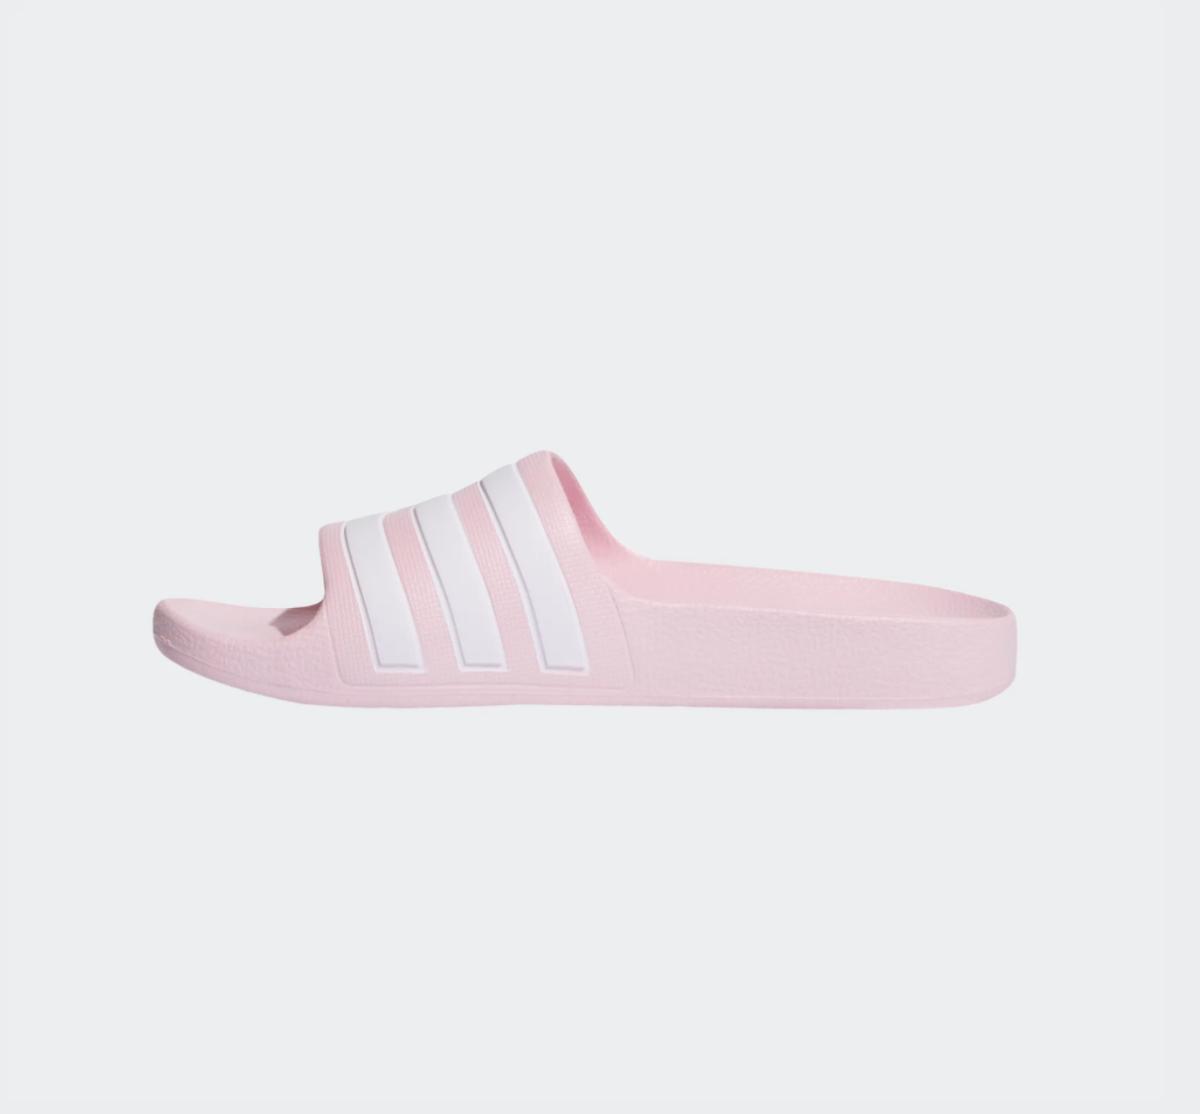 Rosa Adidas Adilette Aqua Sandaler